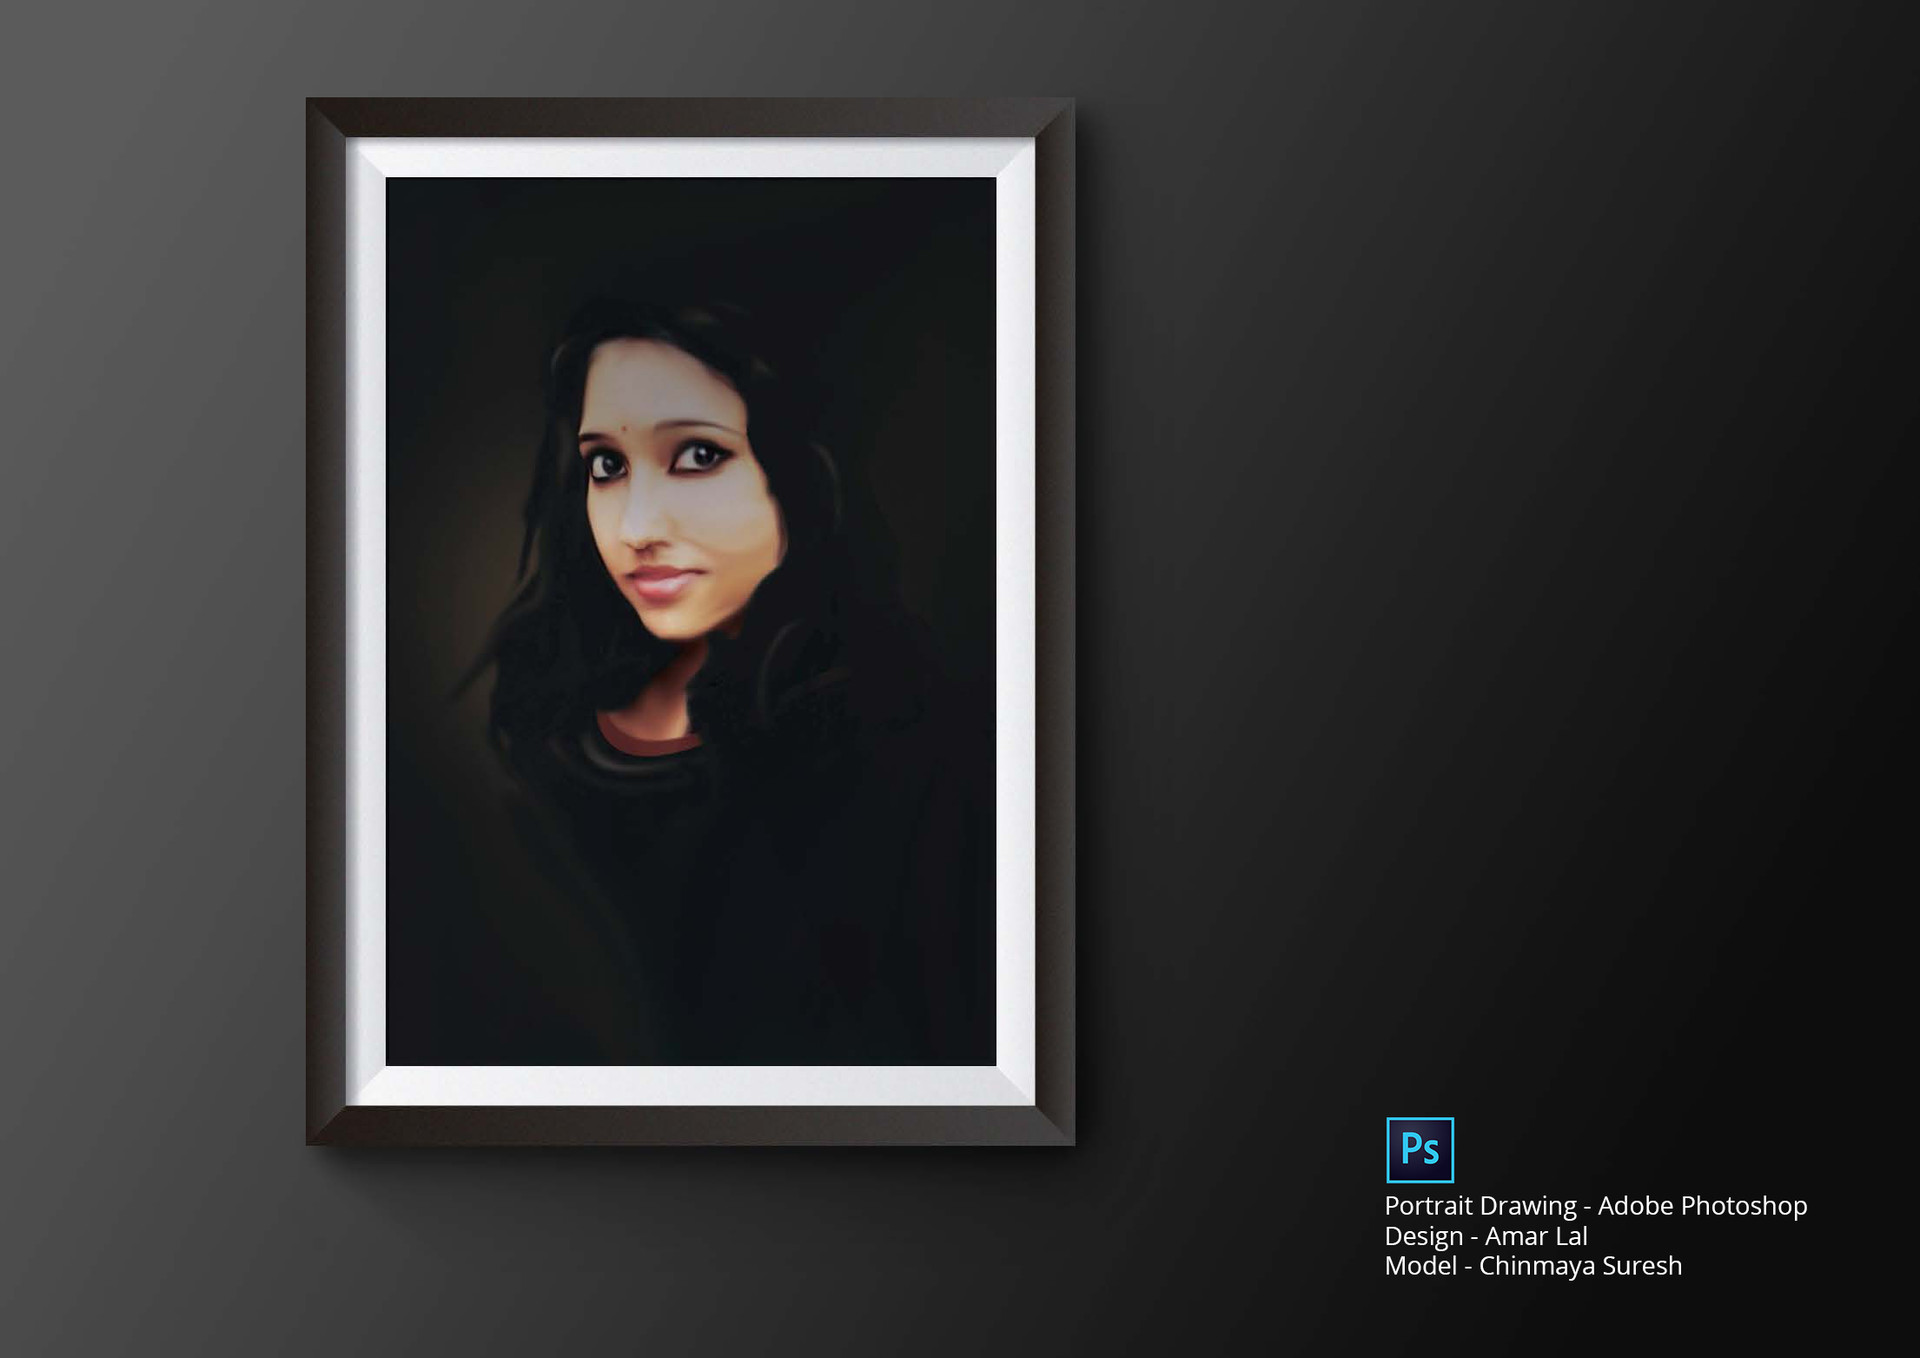 Amar lal myfolio 2 chinnu portfolio design